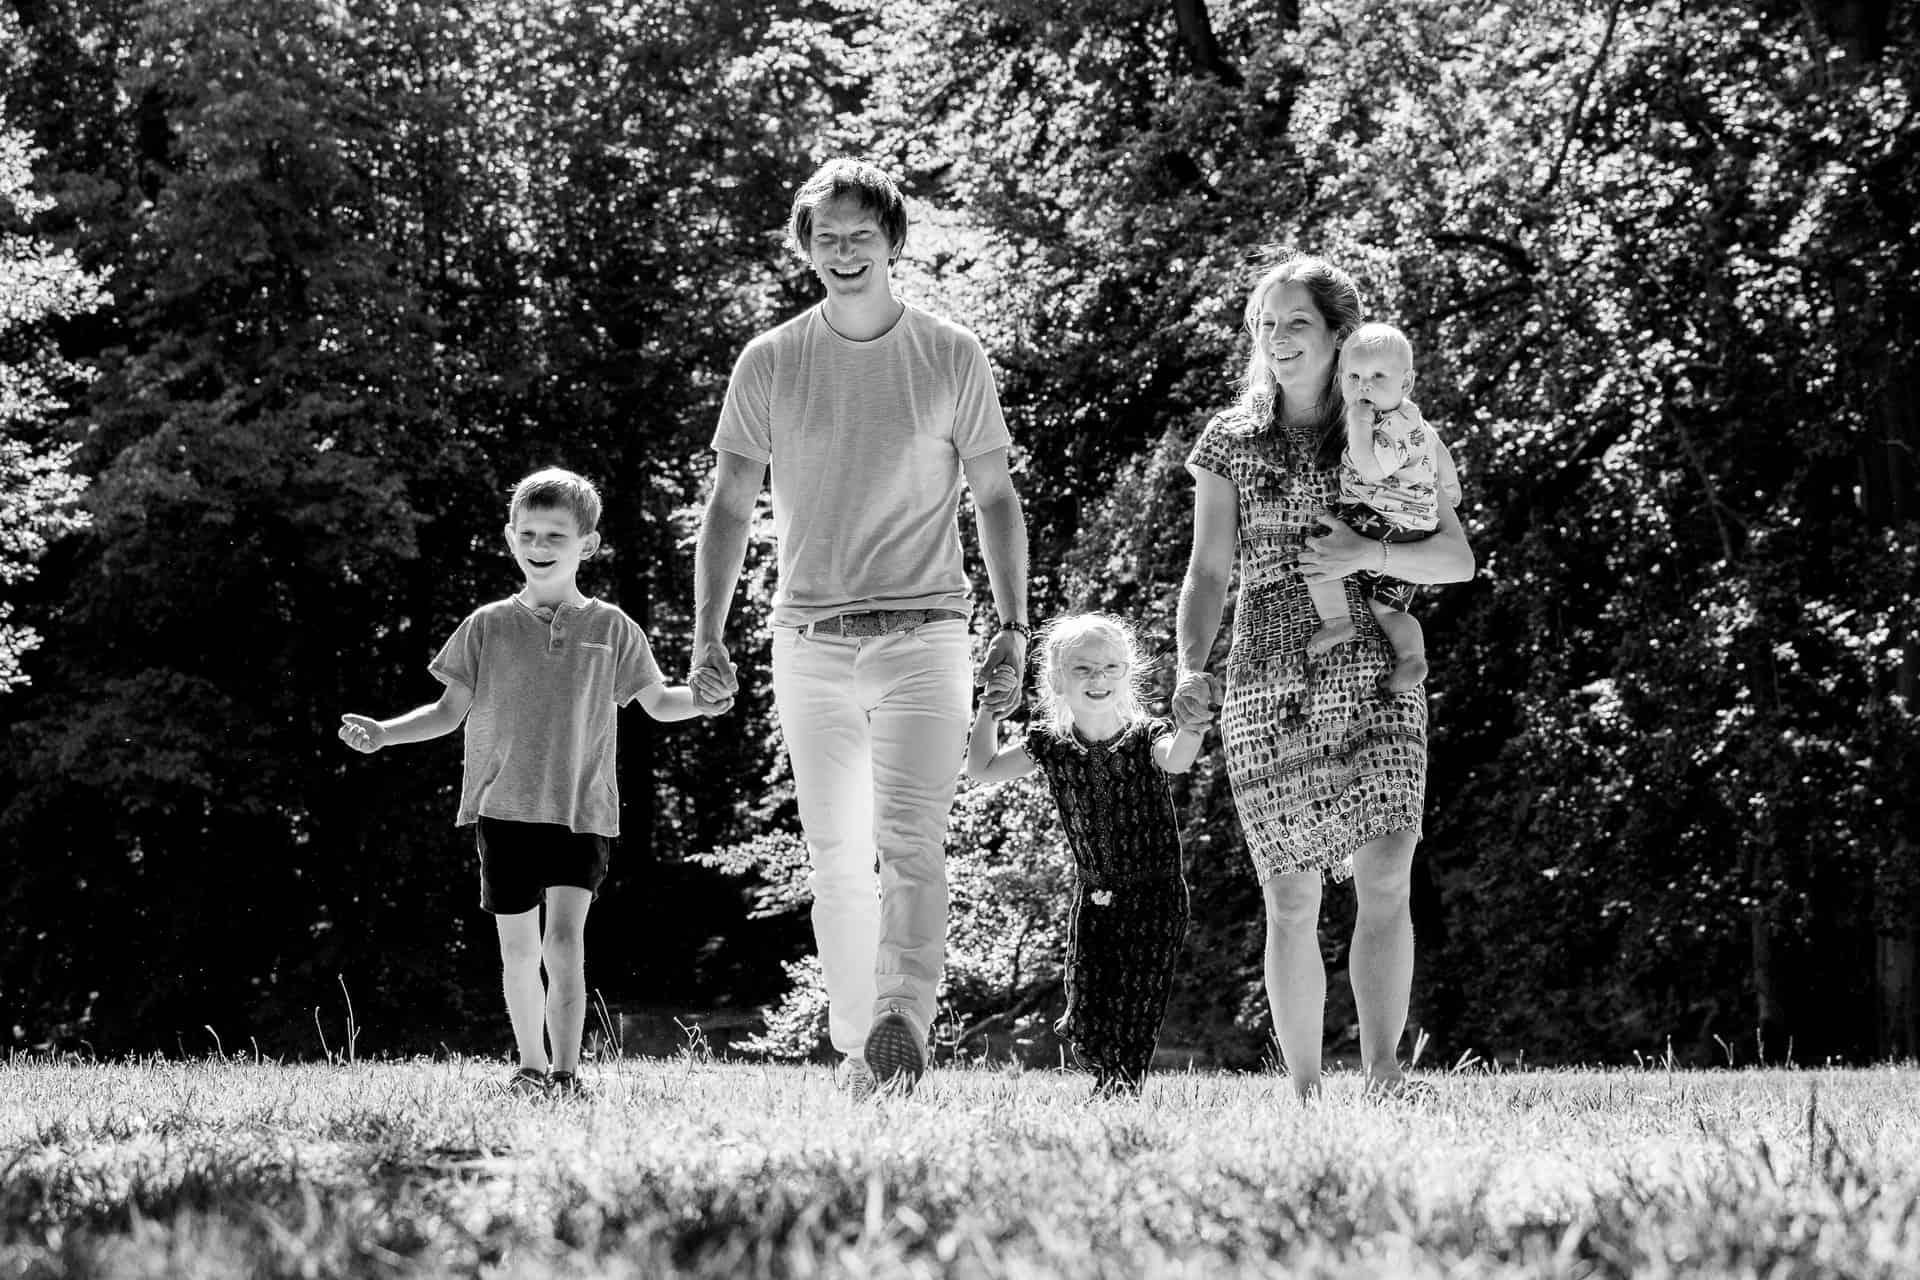 Familieportret, familyshoot, familiereportage, familiefotografie